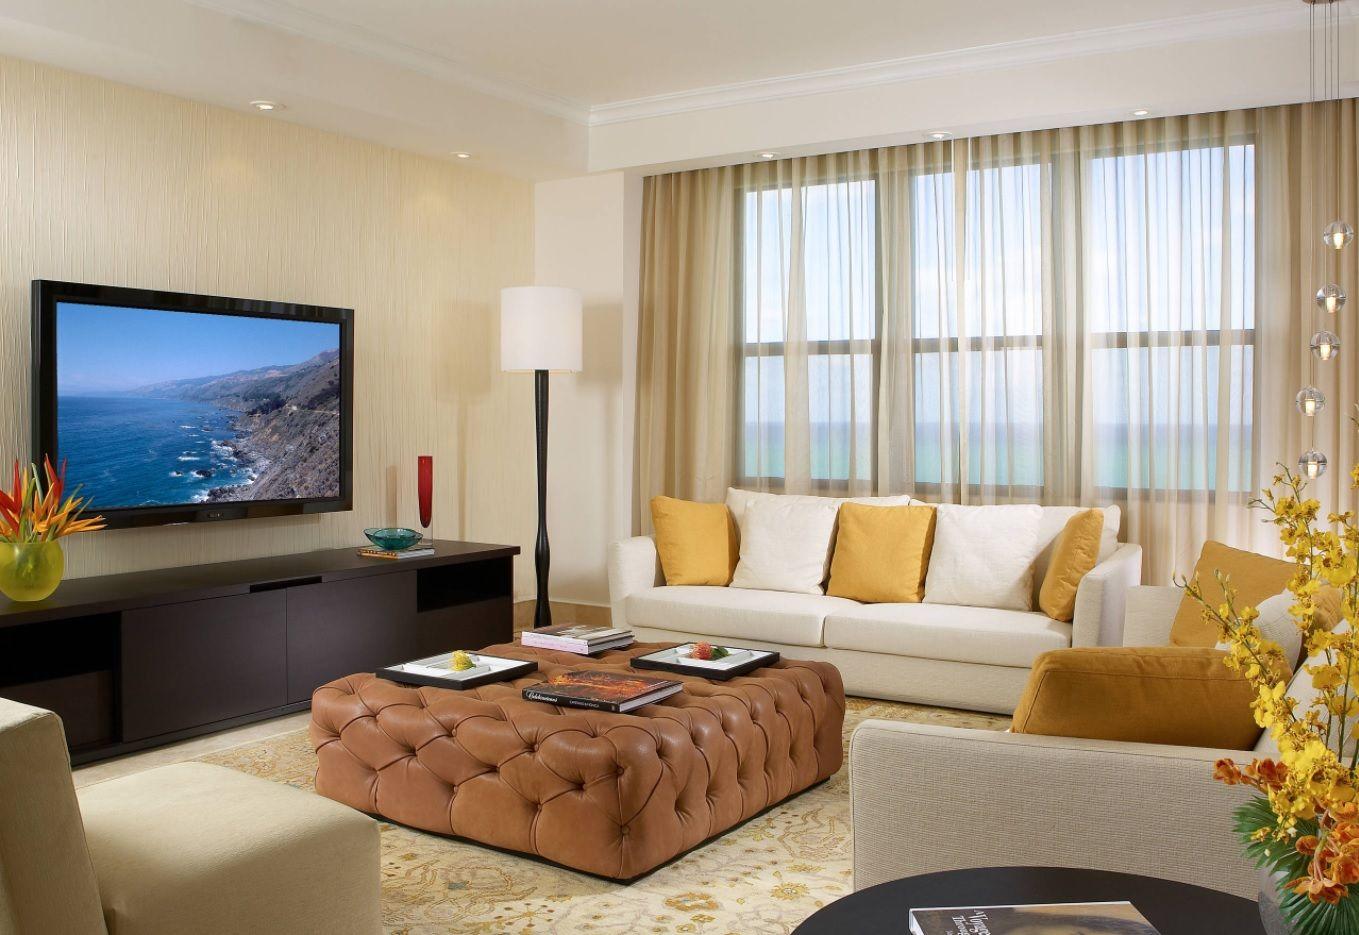 Zen Interior Design Concept For Your Home Original Leather Coffe Table Imtating Kotatsu